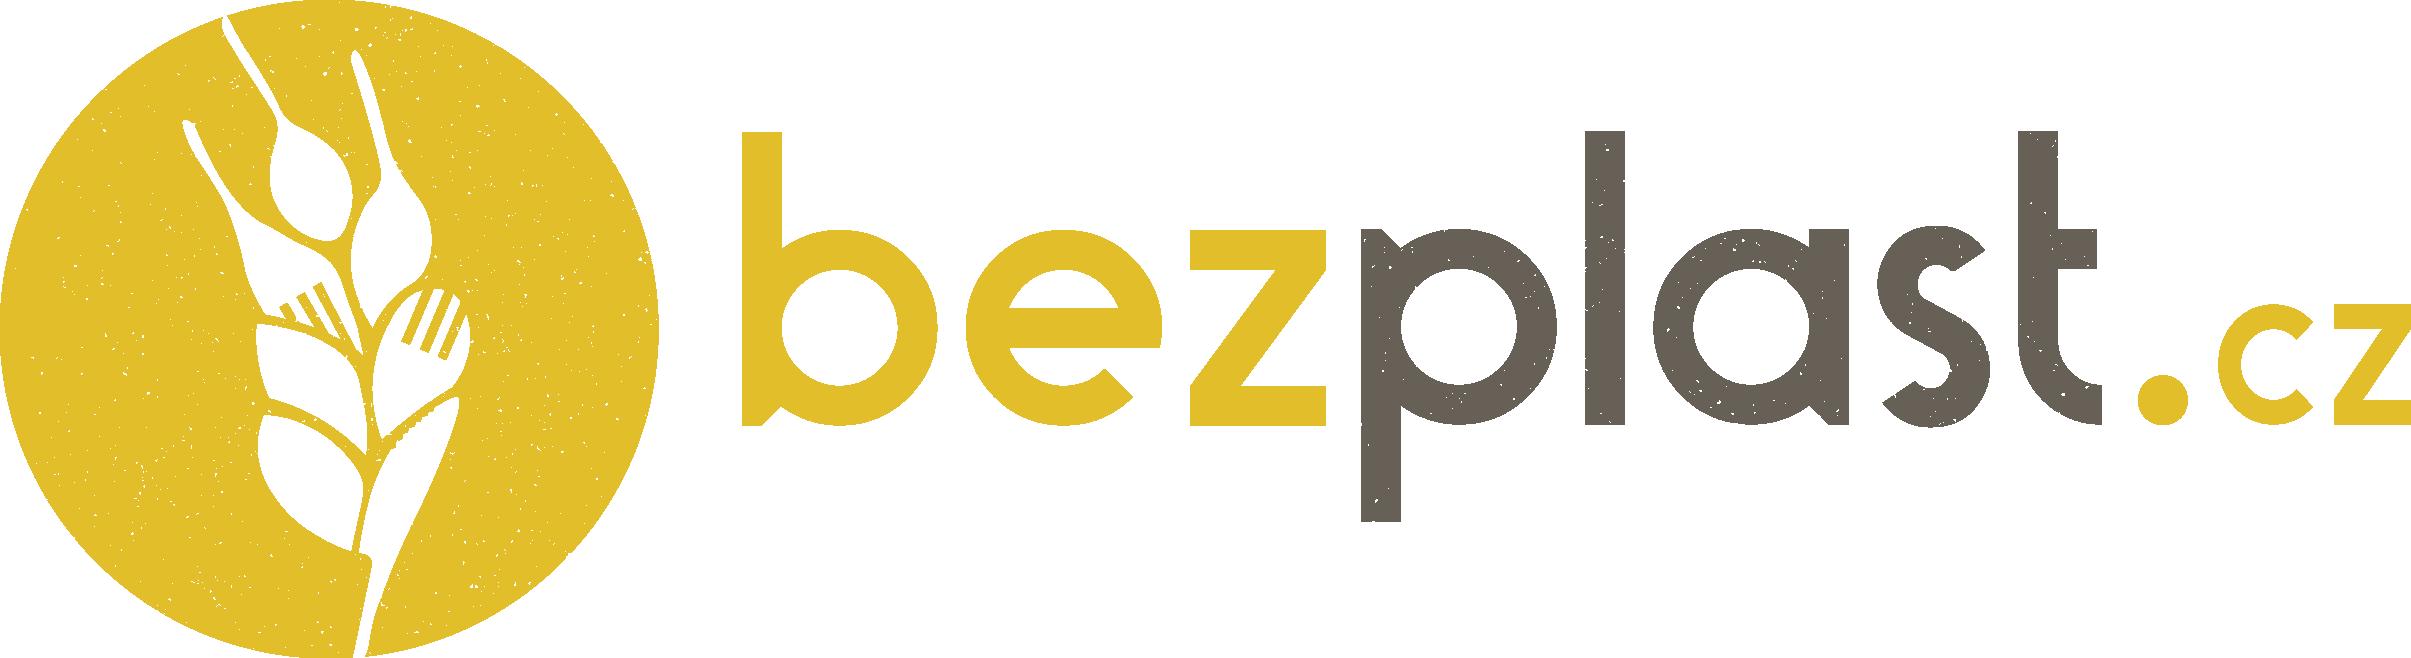 Bezplast.cz